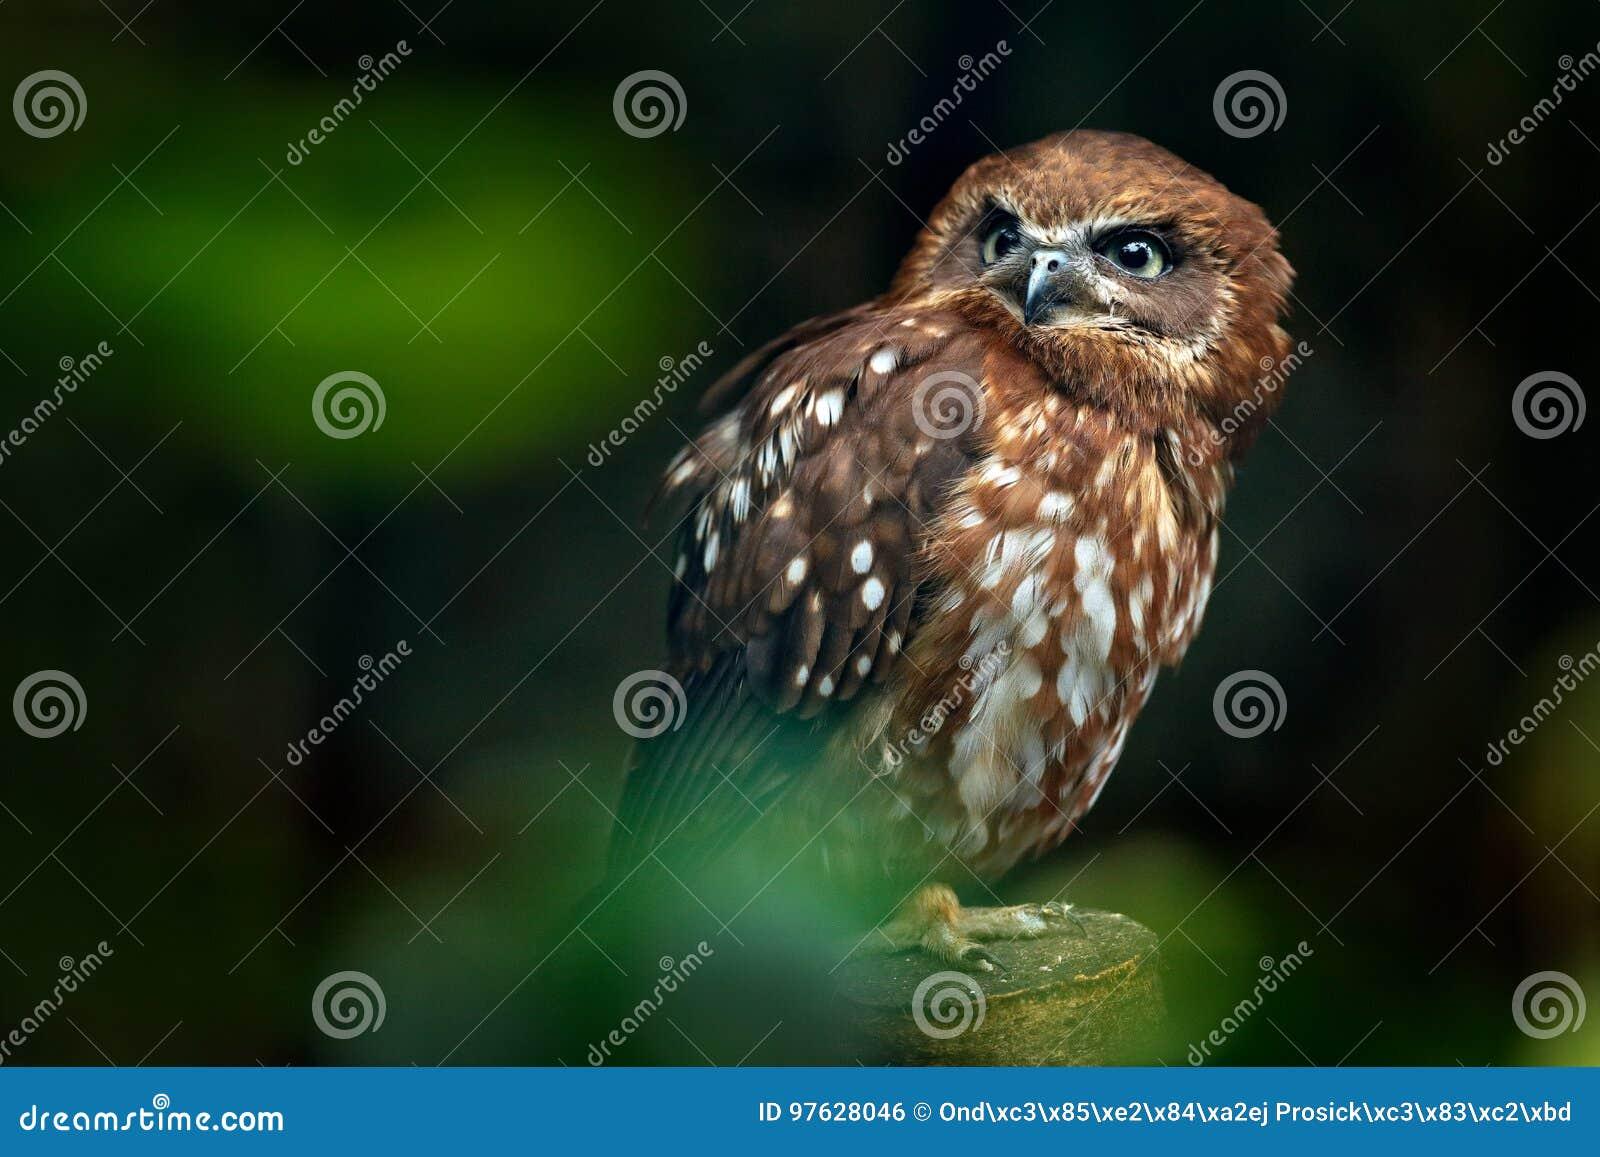 Brun wood uggla, Strixleptogrammica, sällsynt fågel från Asien Malaysia härlig uggla i naturskoglivsmiljön Fågel från Malaysia